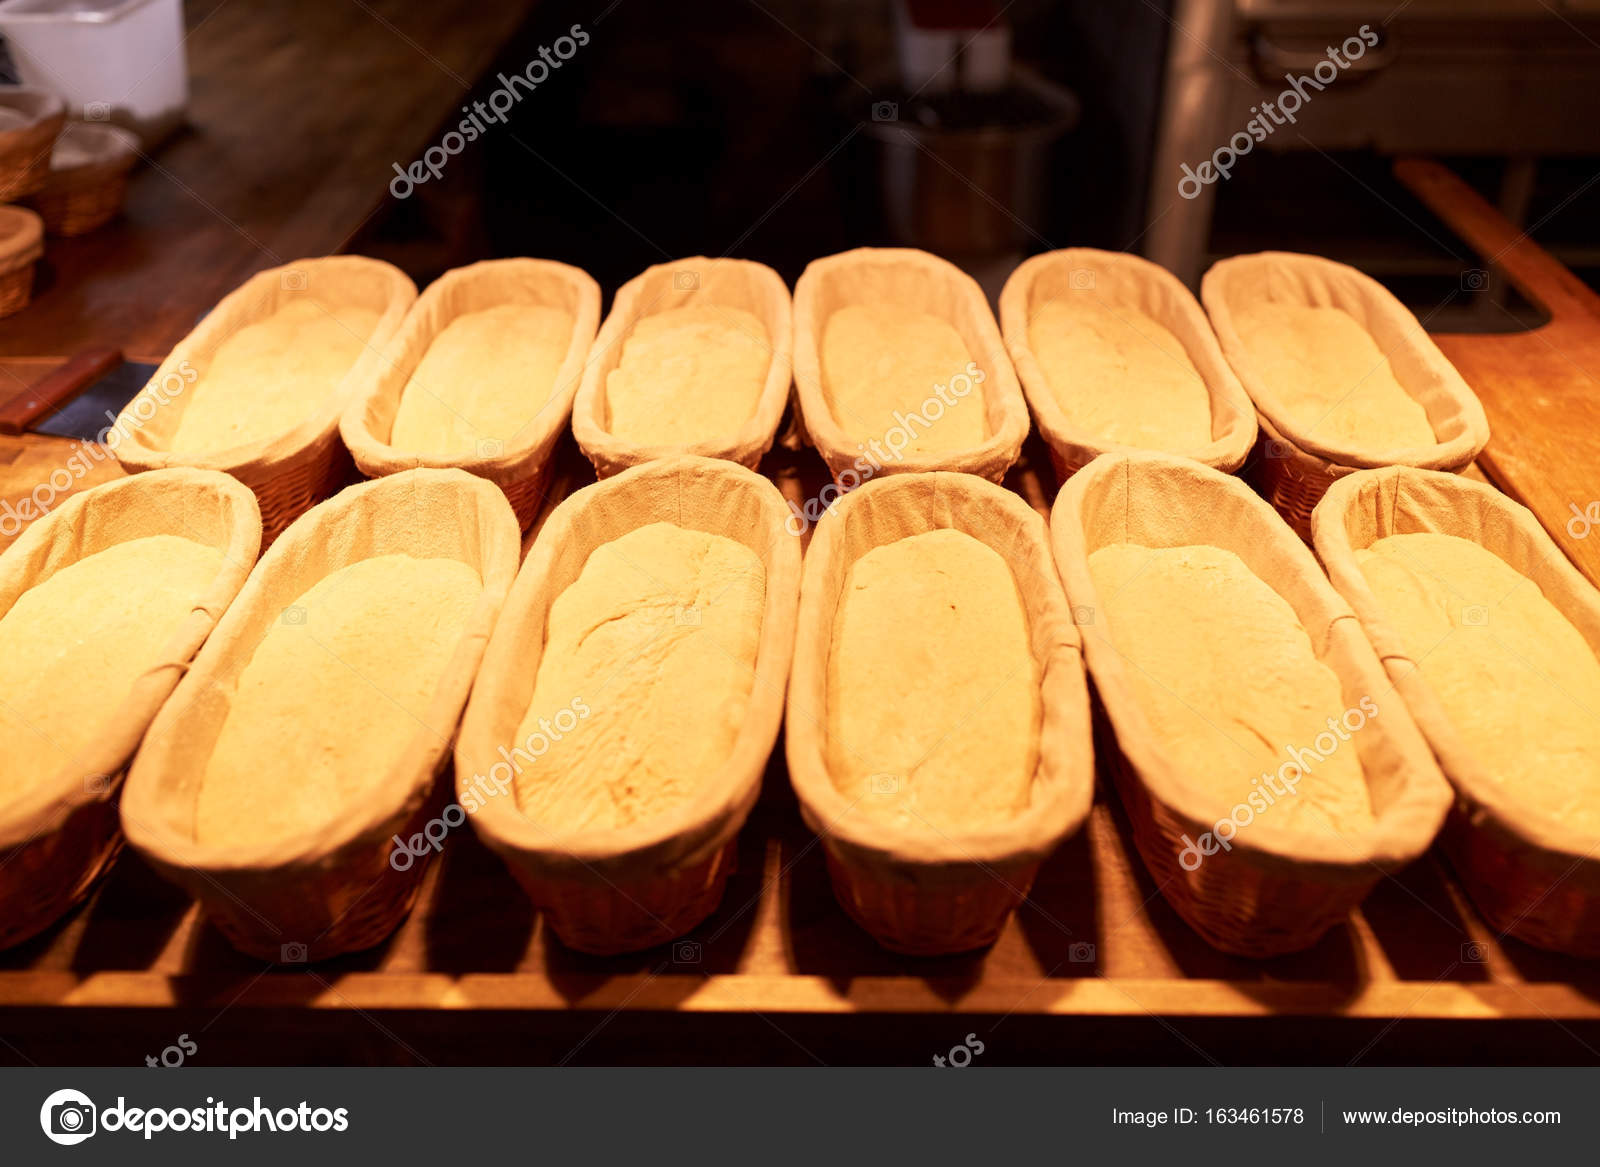 kitchen basket cork floor 酵母面包面团在面包店厨房在篮子里 图库照片 c syda productions 163461578